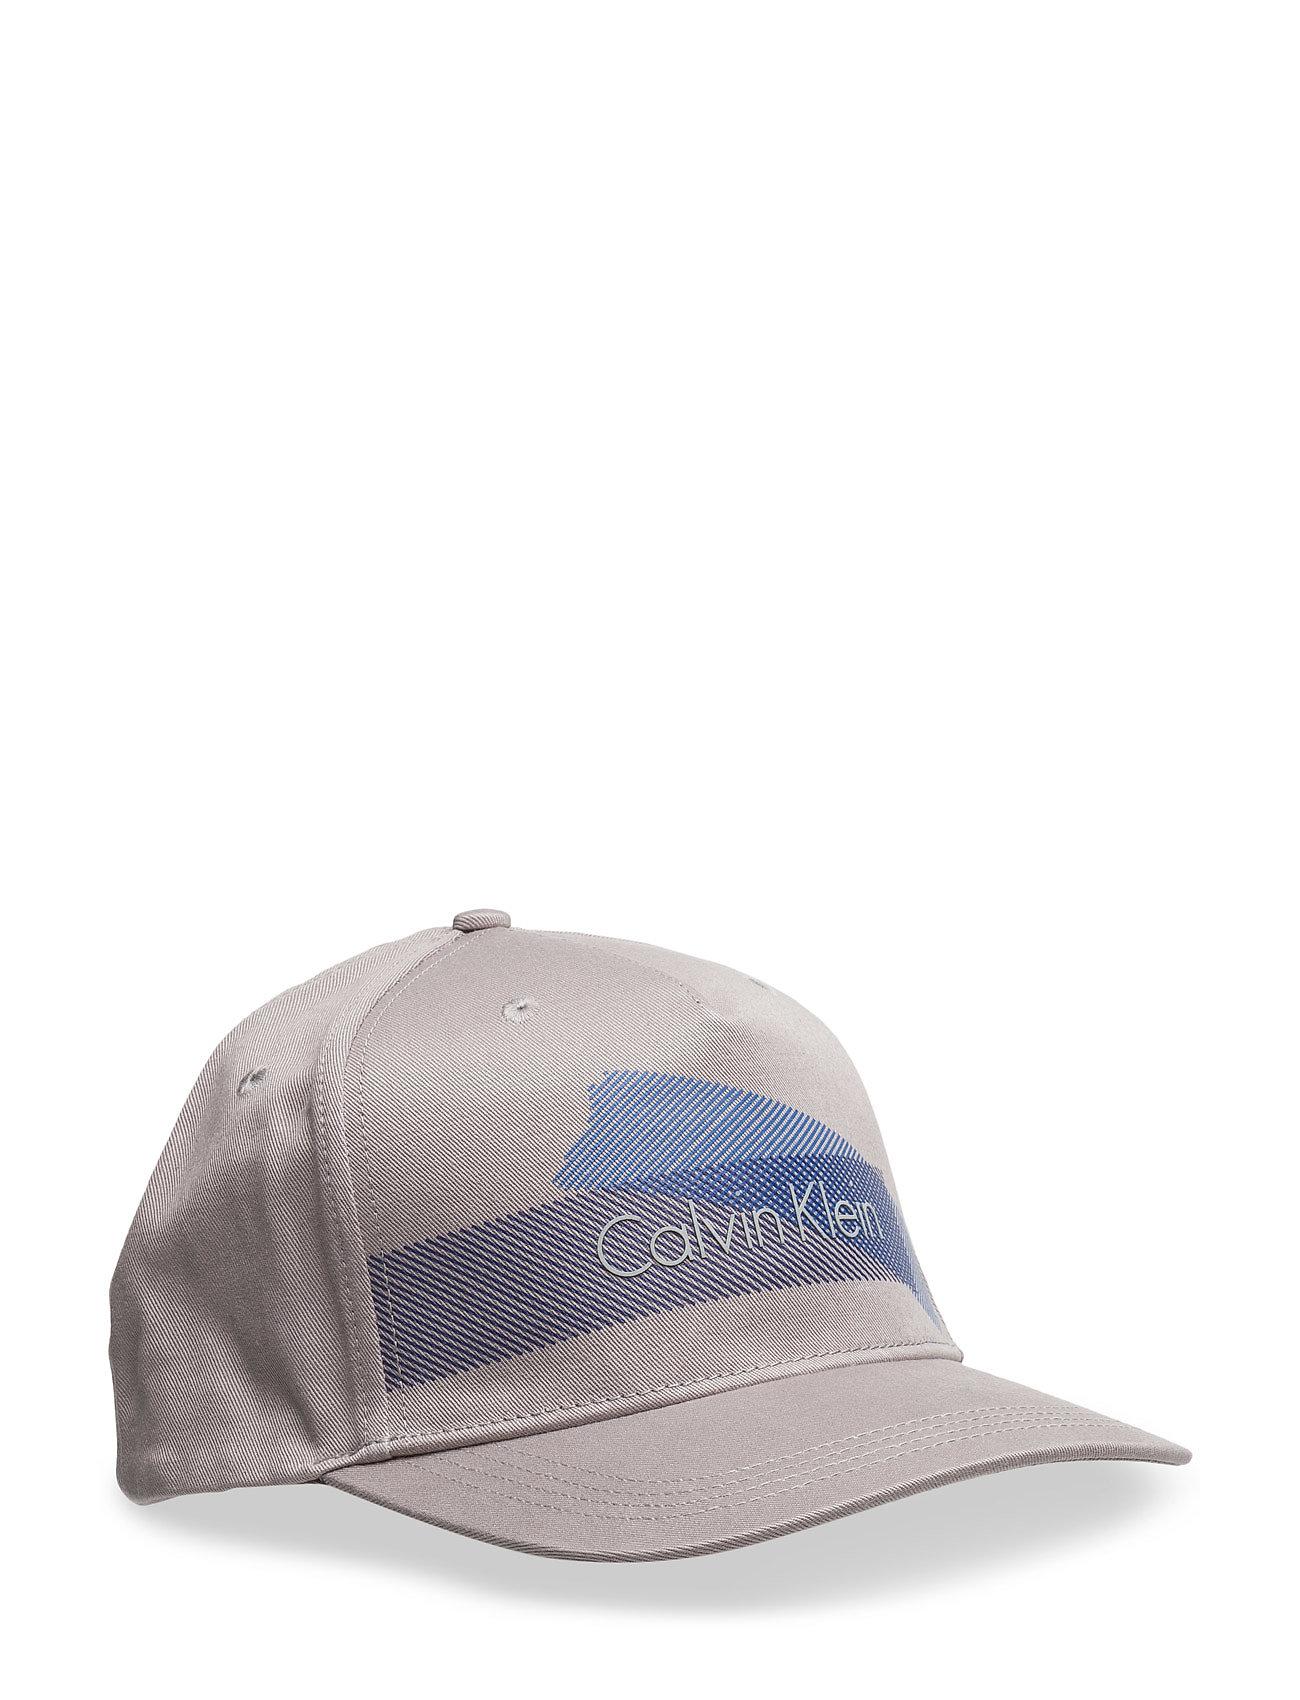 Cole Baseball Cap 64 Calvin Klein Accessories til Mænd i Sten